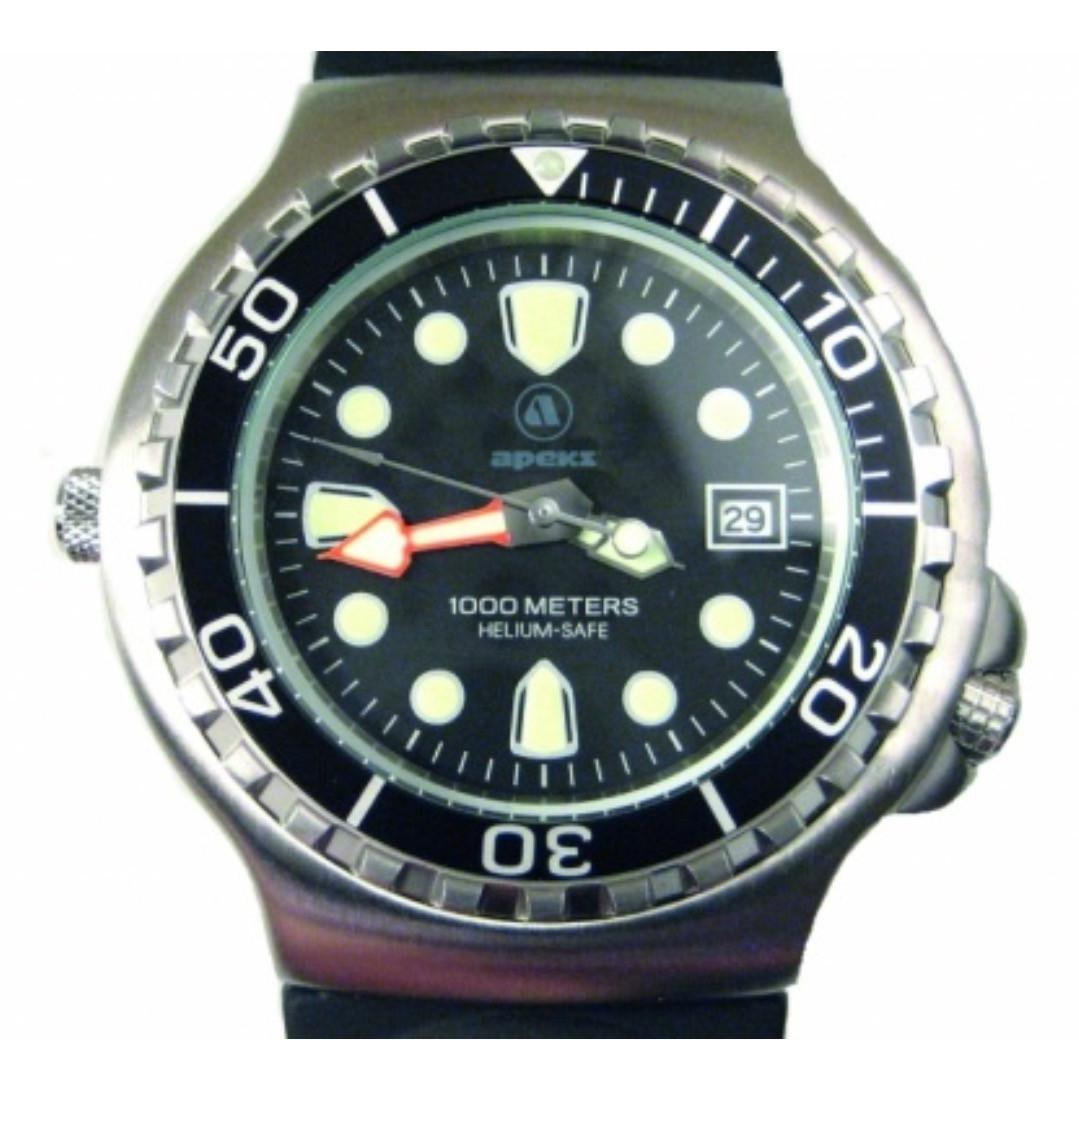 Apeks 1000m Scuba Diving Watch in Presentation Case